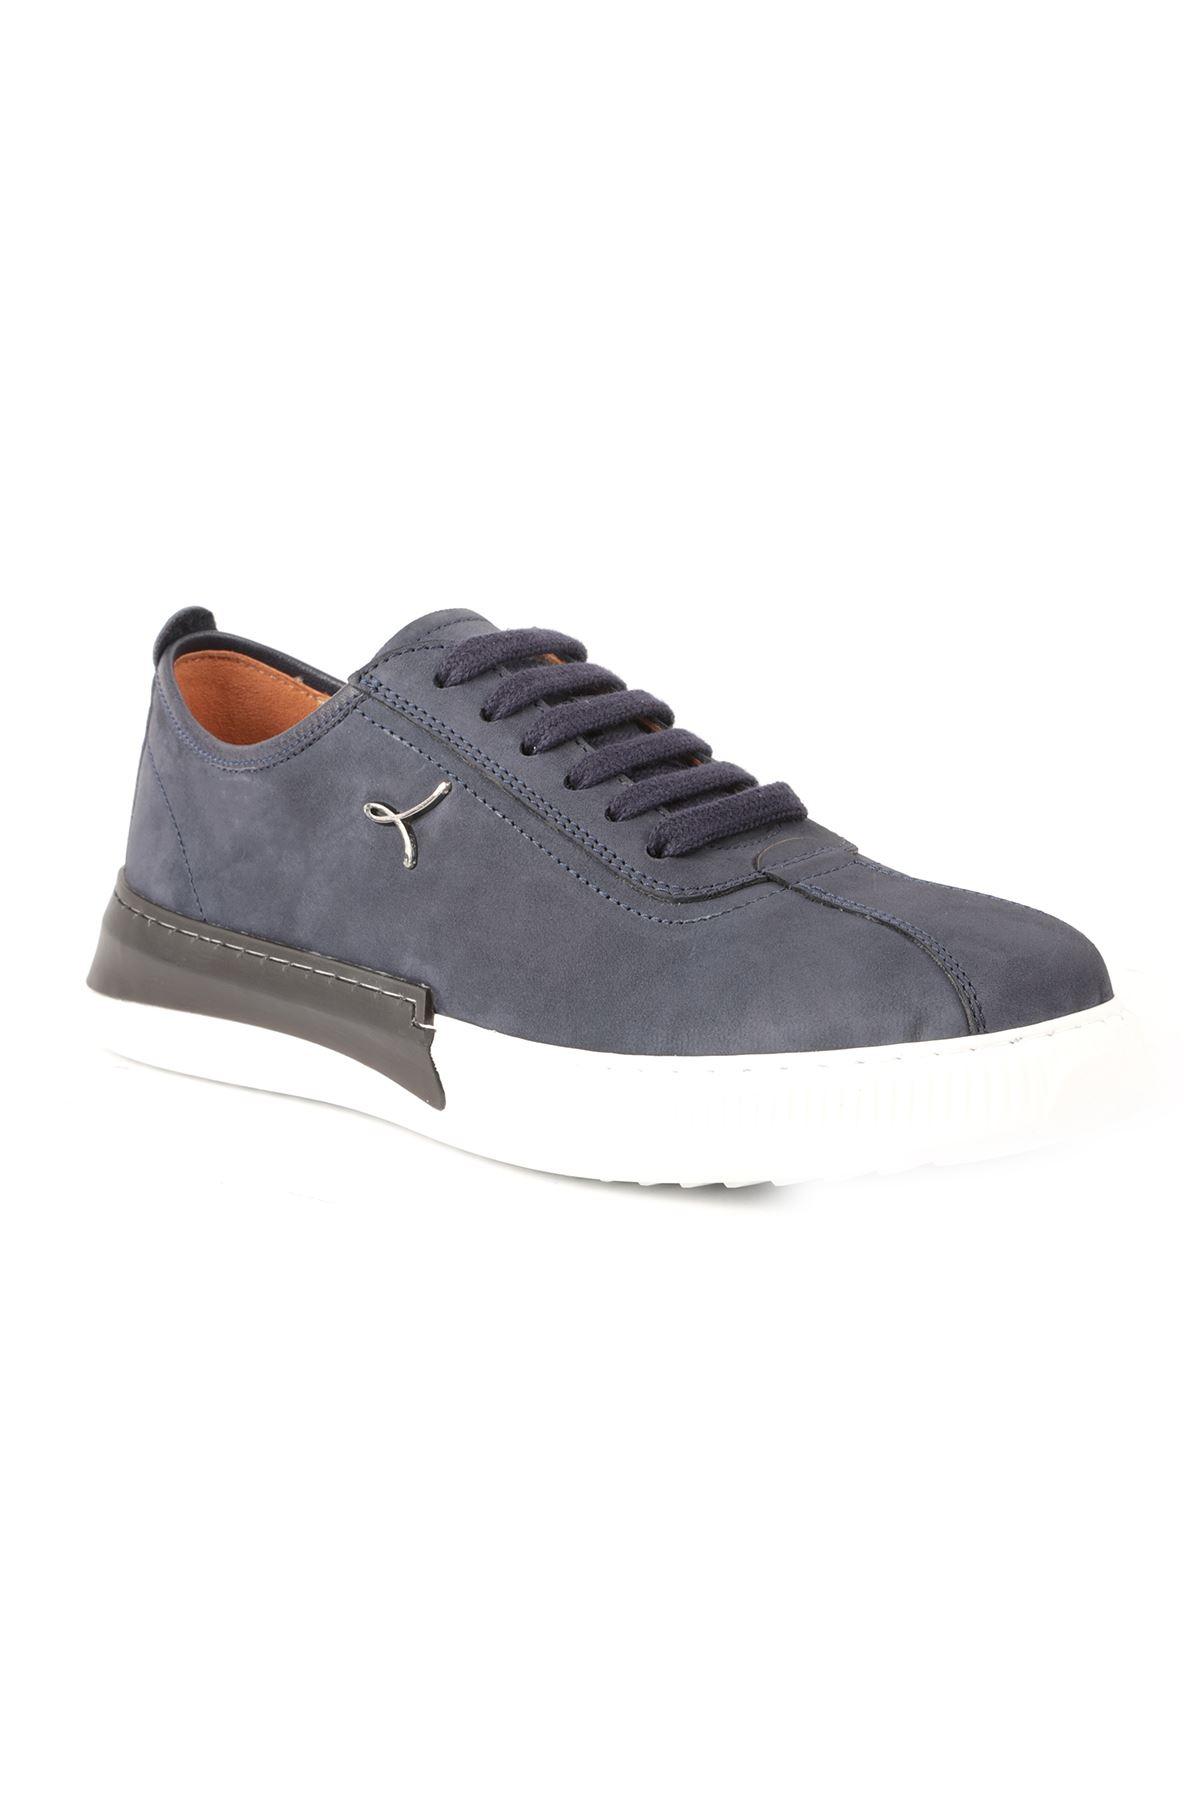 Libero L3674 Navy Blue Men Sport Shoes